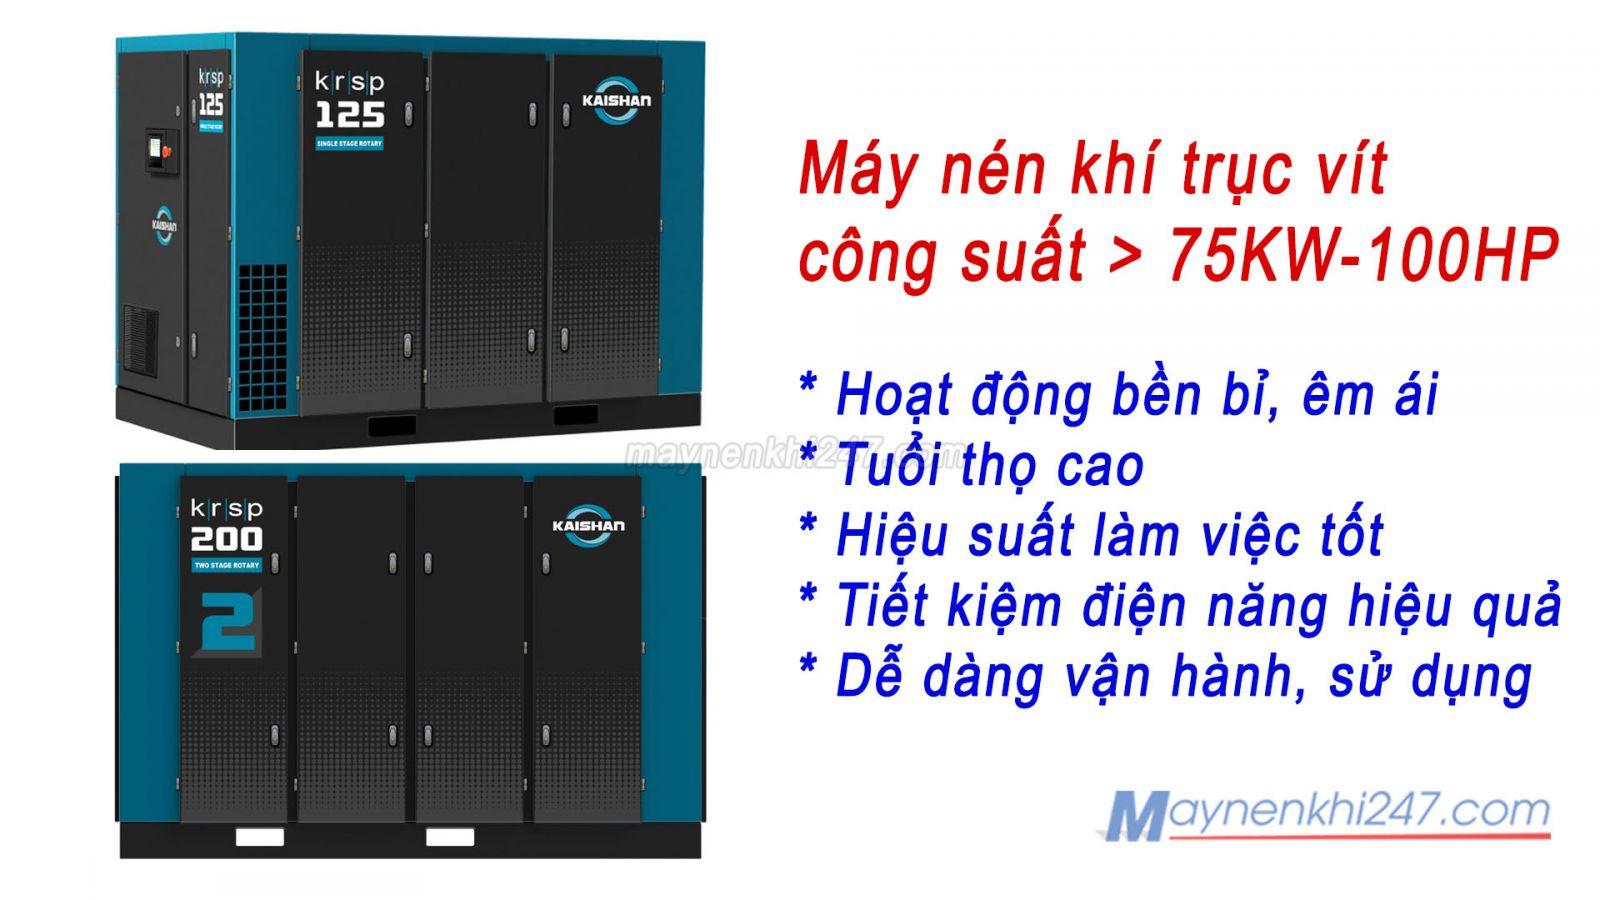 may-nen-khi-truc-vit-tren-75kw-100hp